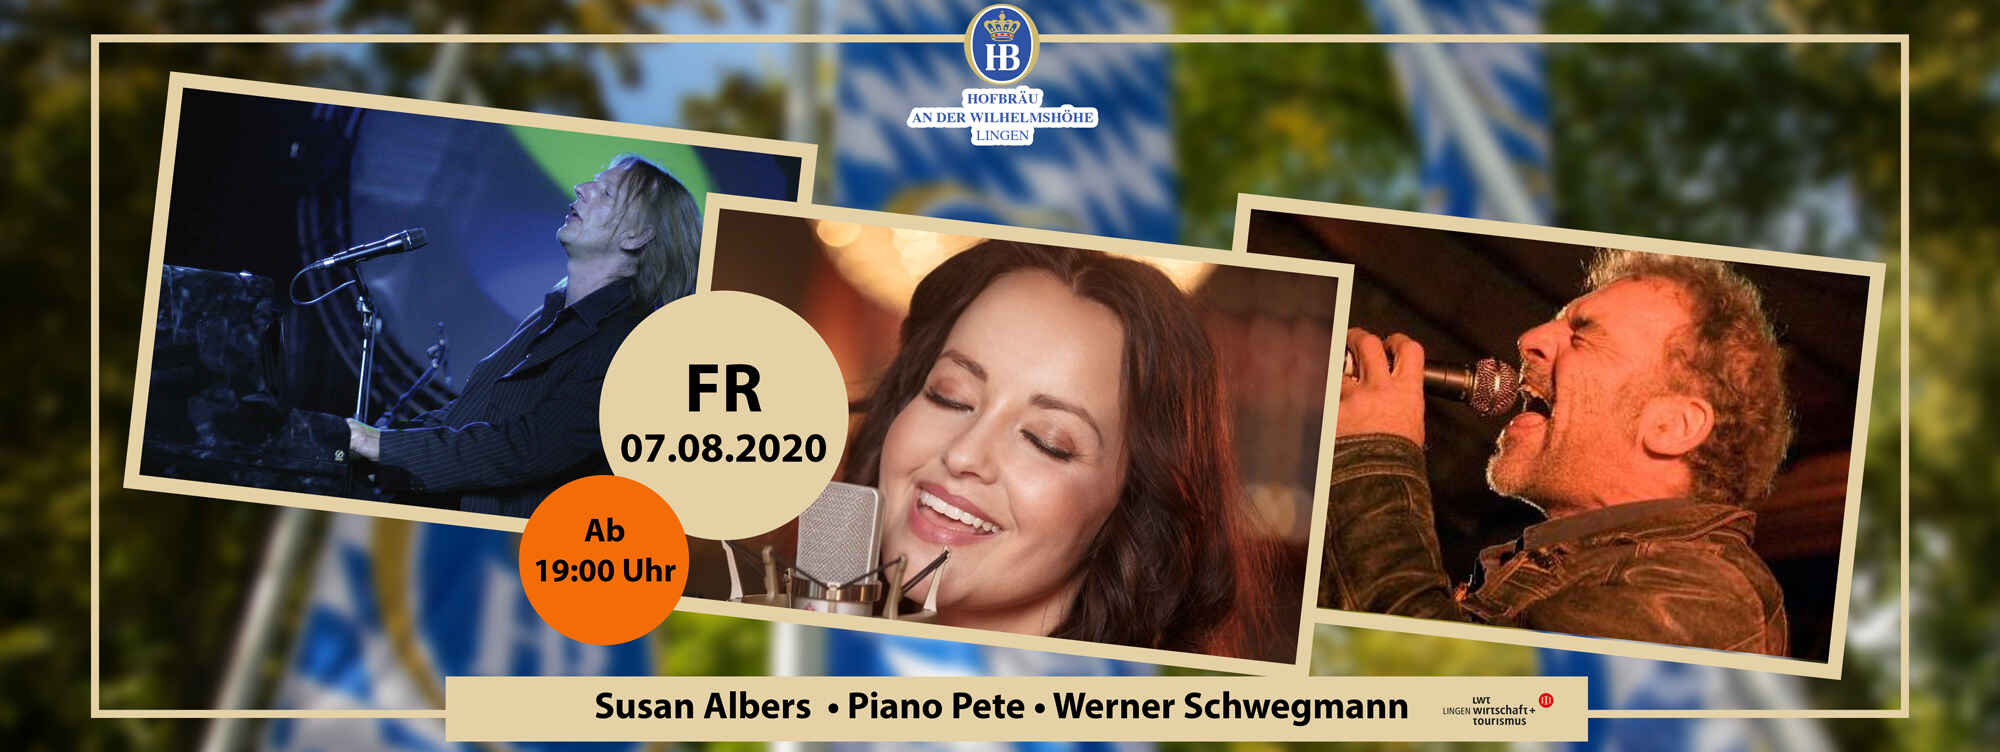 Kleiner Lingener Sommer • 07.08.2020